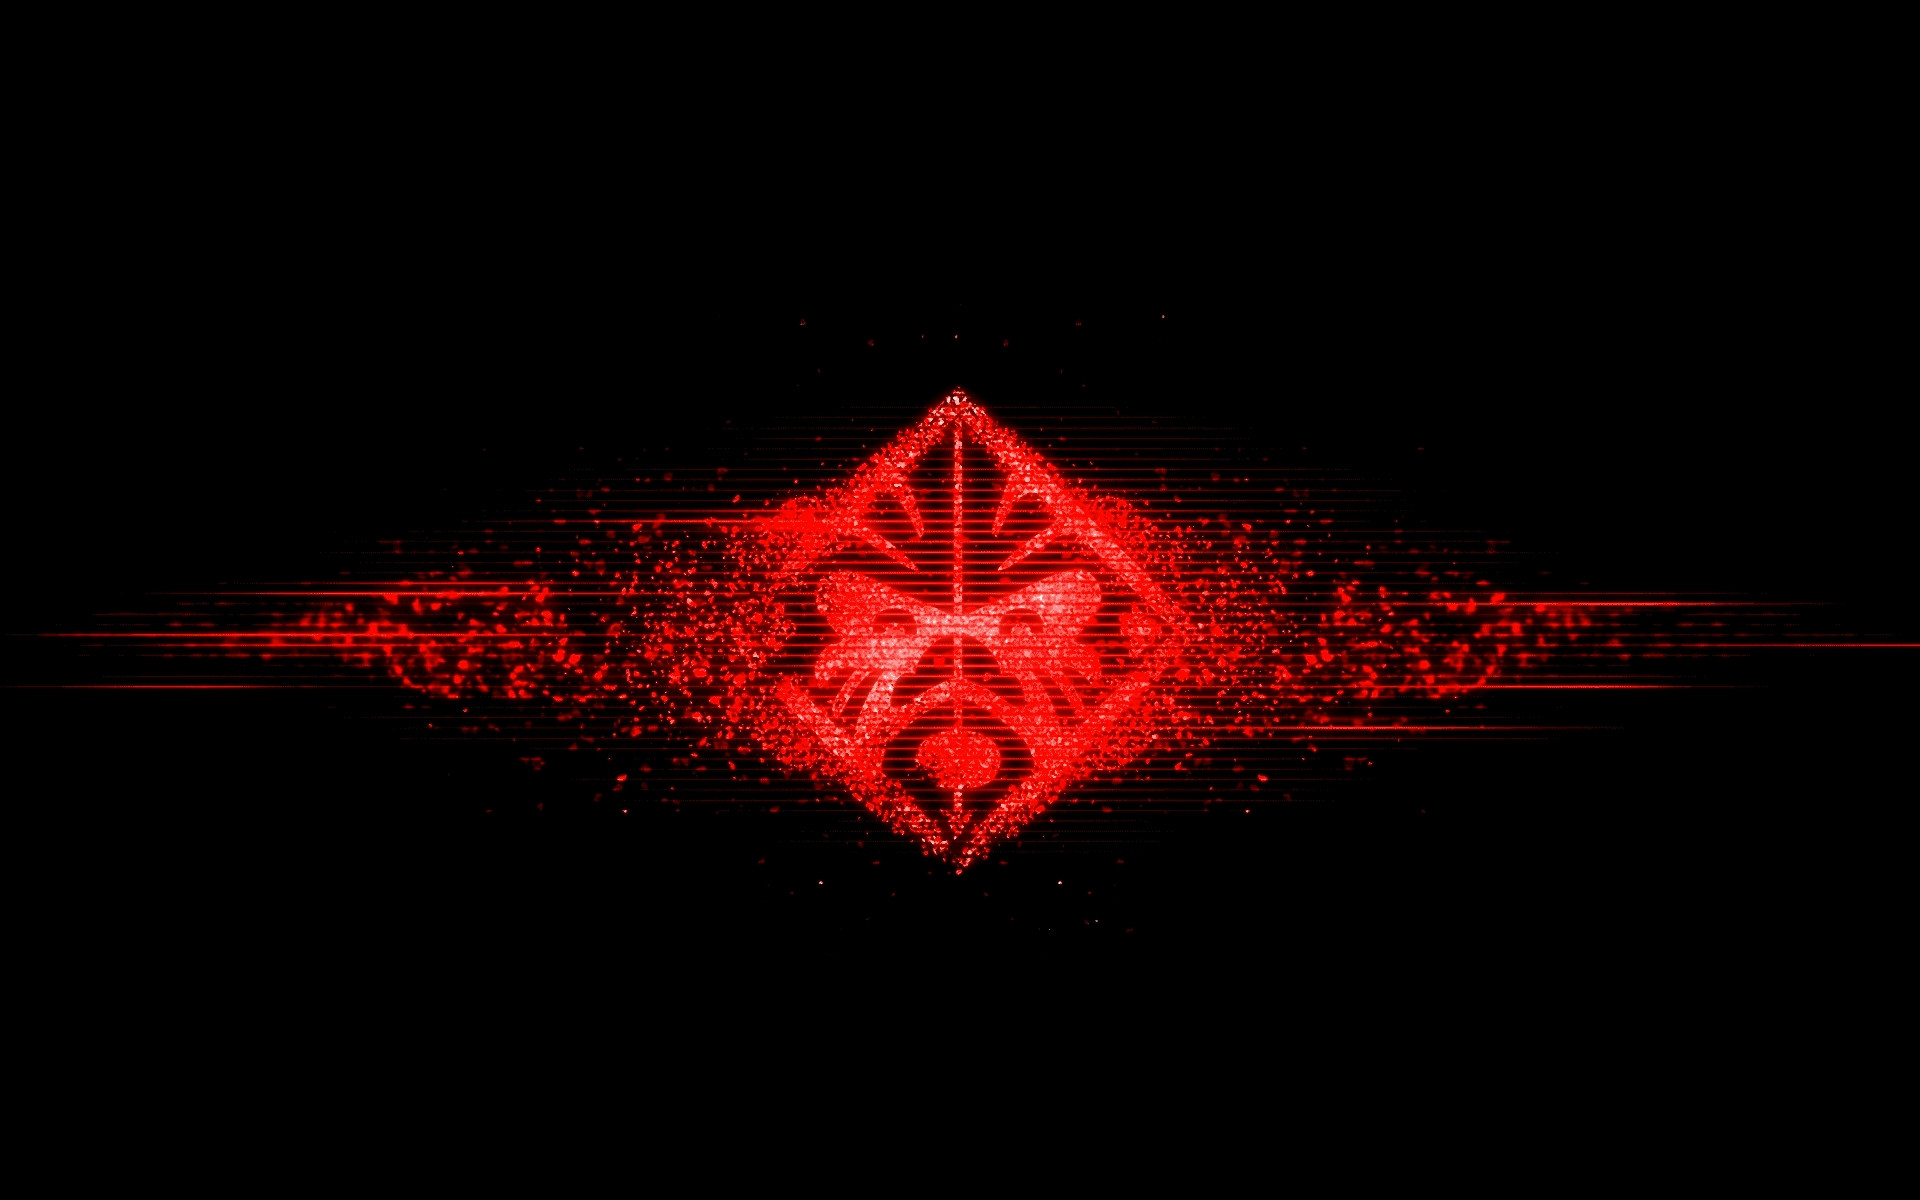 Omen hp in gran forma a games week 2016 td blog - Cisco wallpaper 4k ...